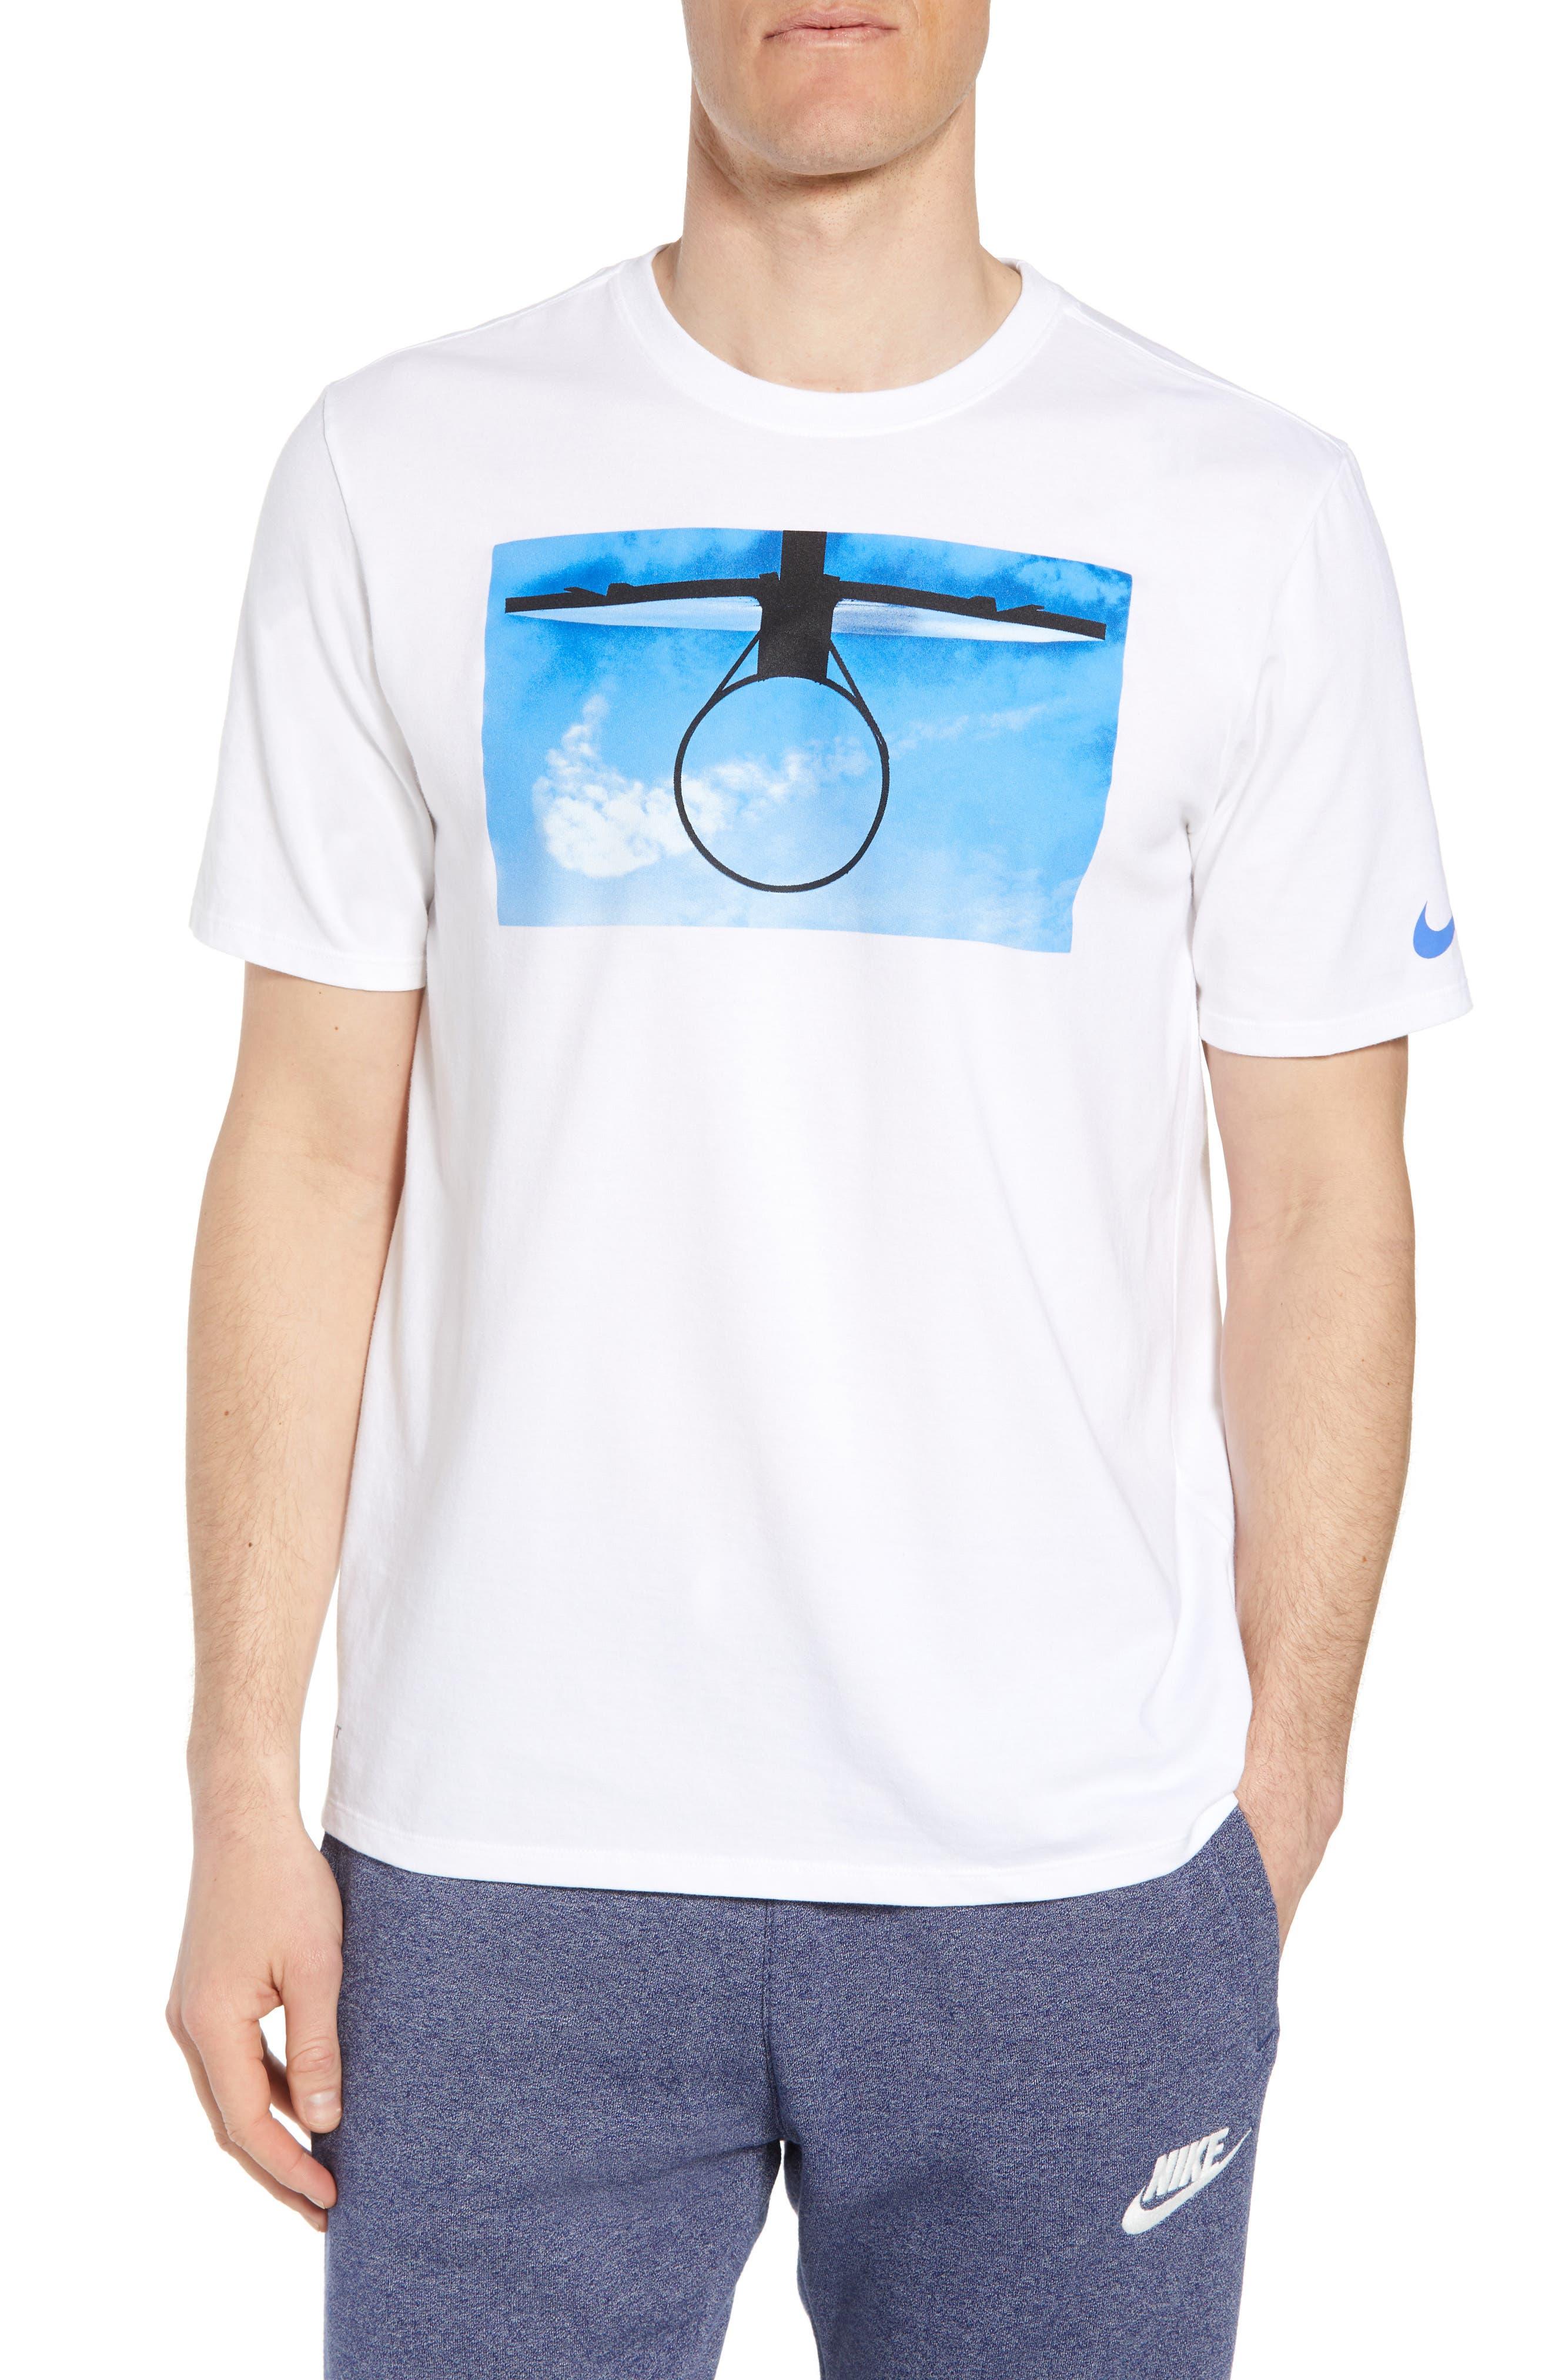 Nike Dri-Fit Basketball Daydream T-Shirt, White